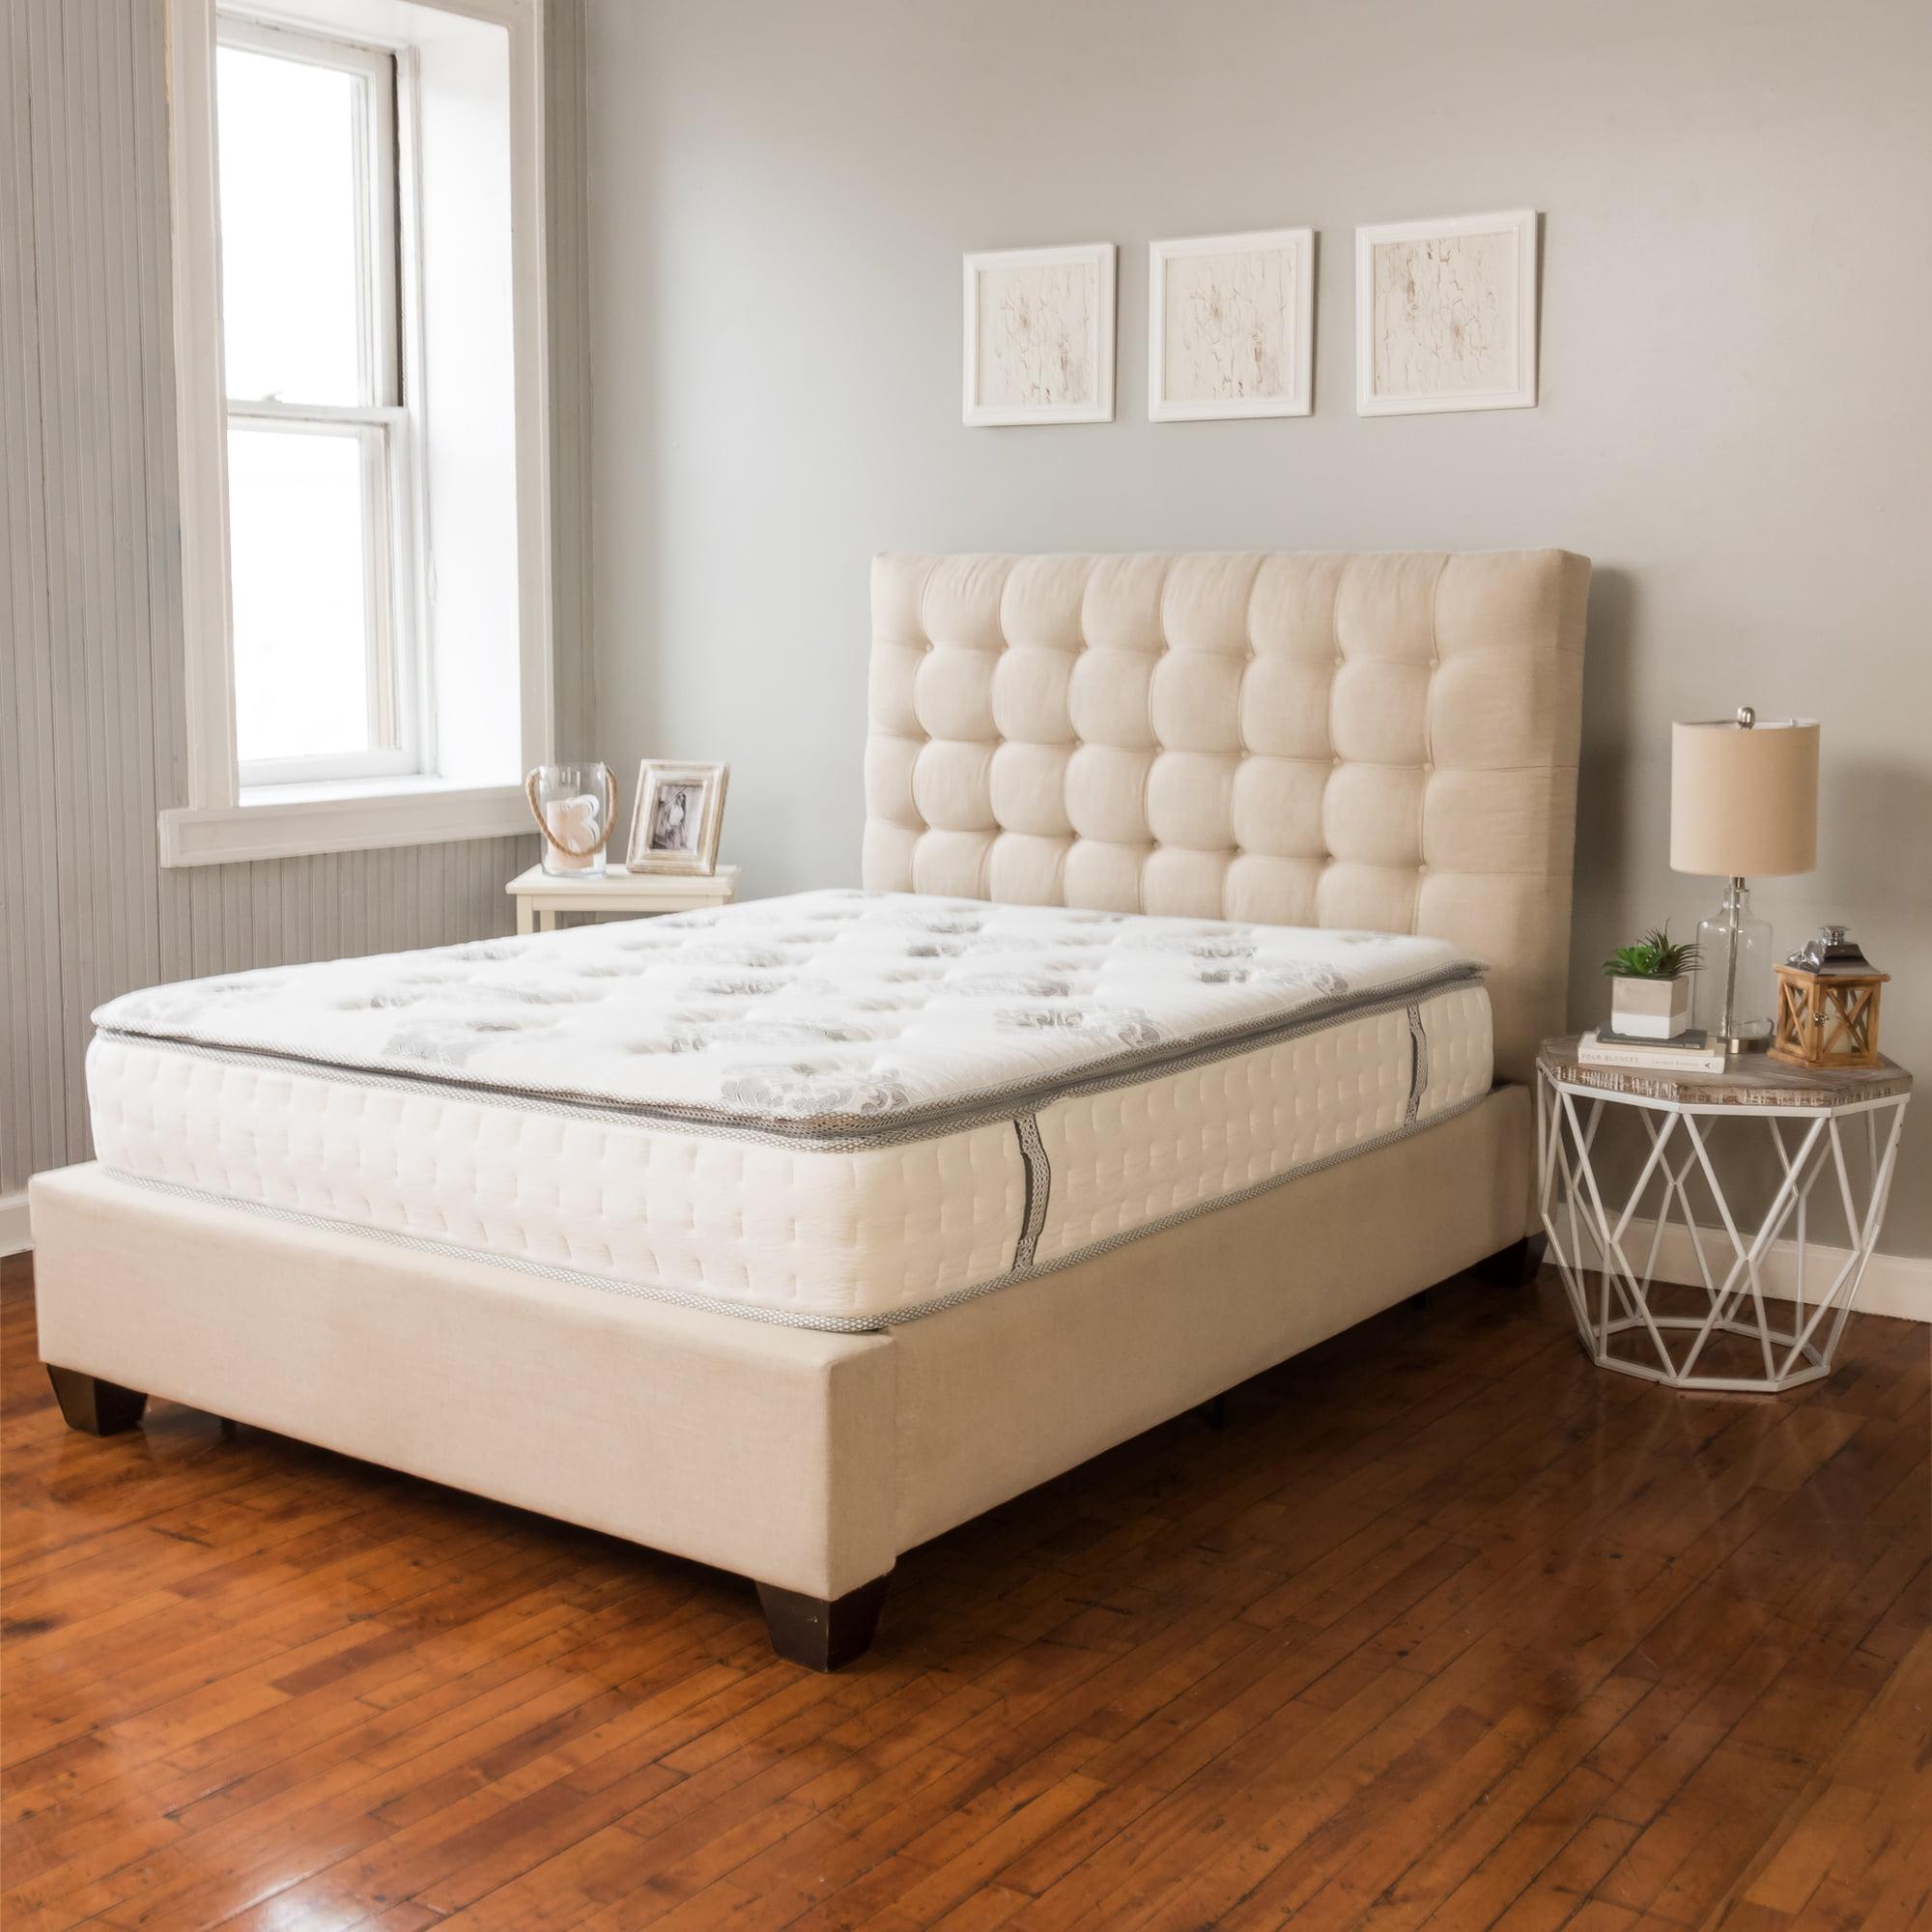 Modern Sleep Mercer Pillow-Top Cool Gel Memory Foam and Innerspring Hybrid 12-Inch... by Classic Brands